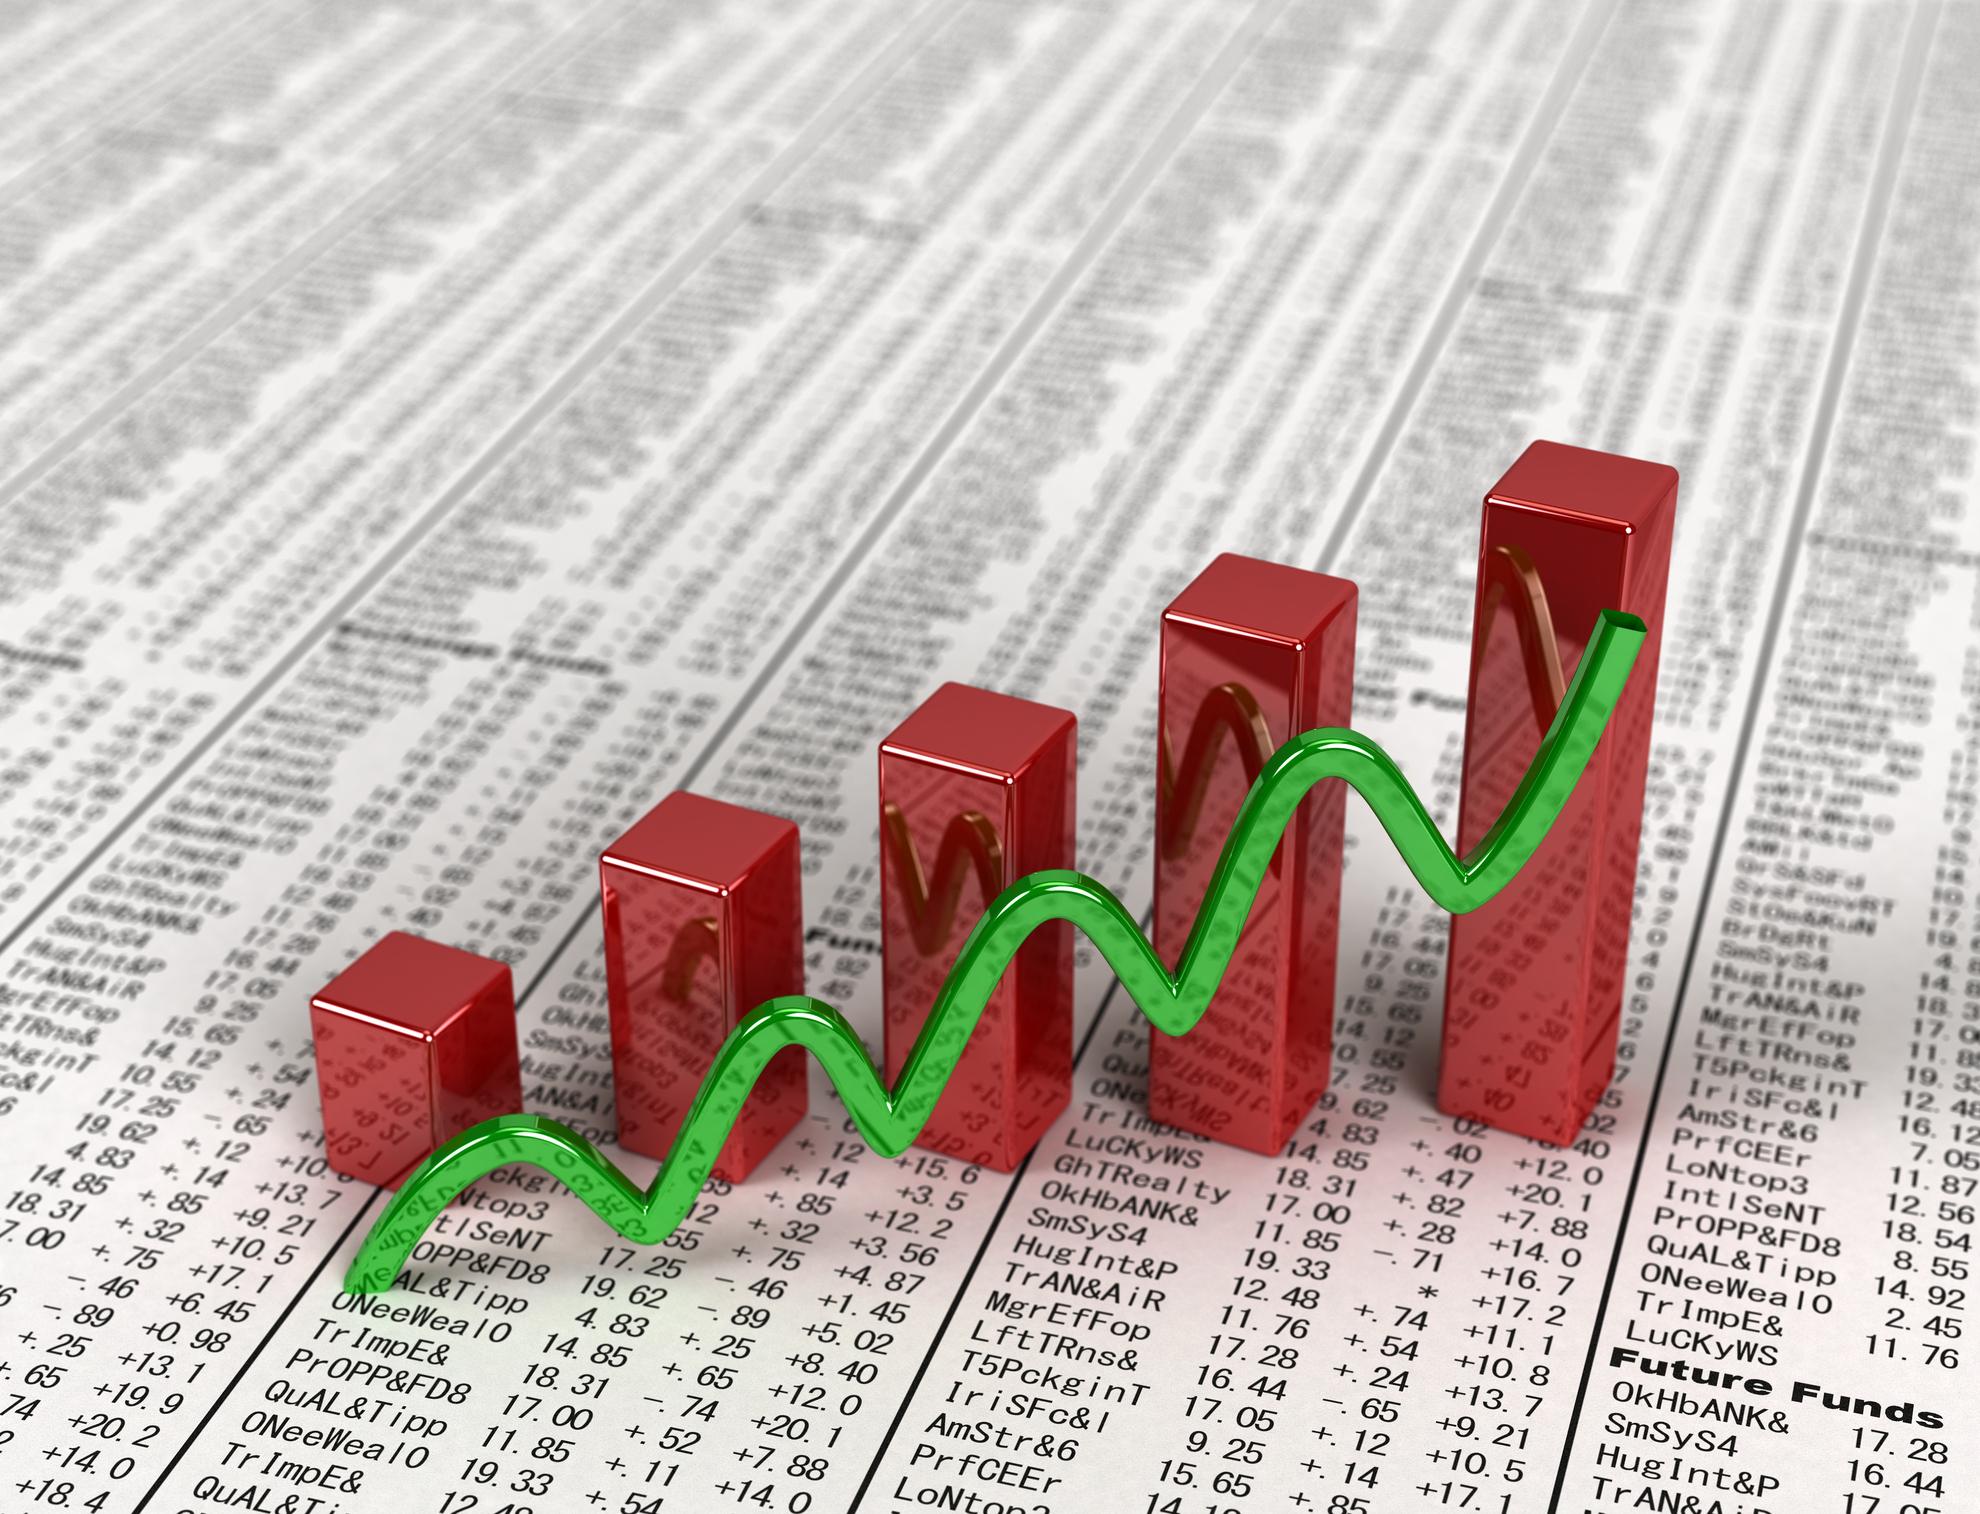 A rising chart atop a financial newspaper.